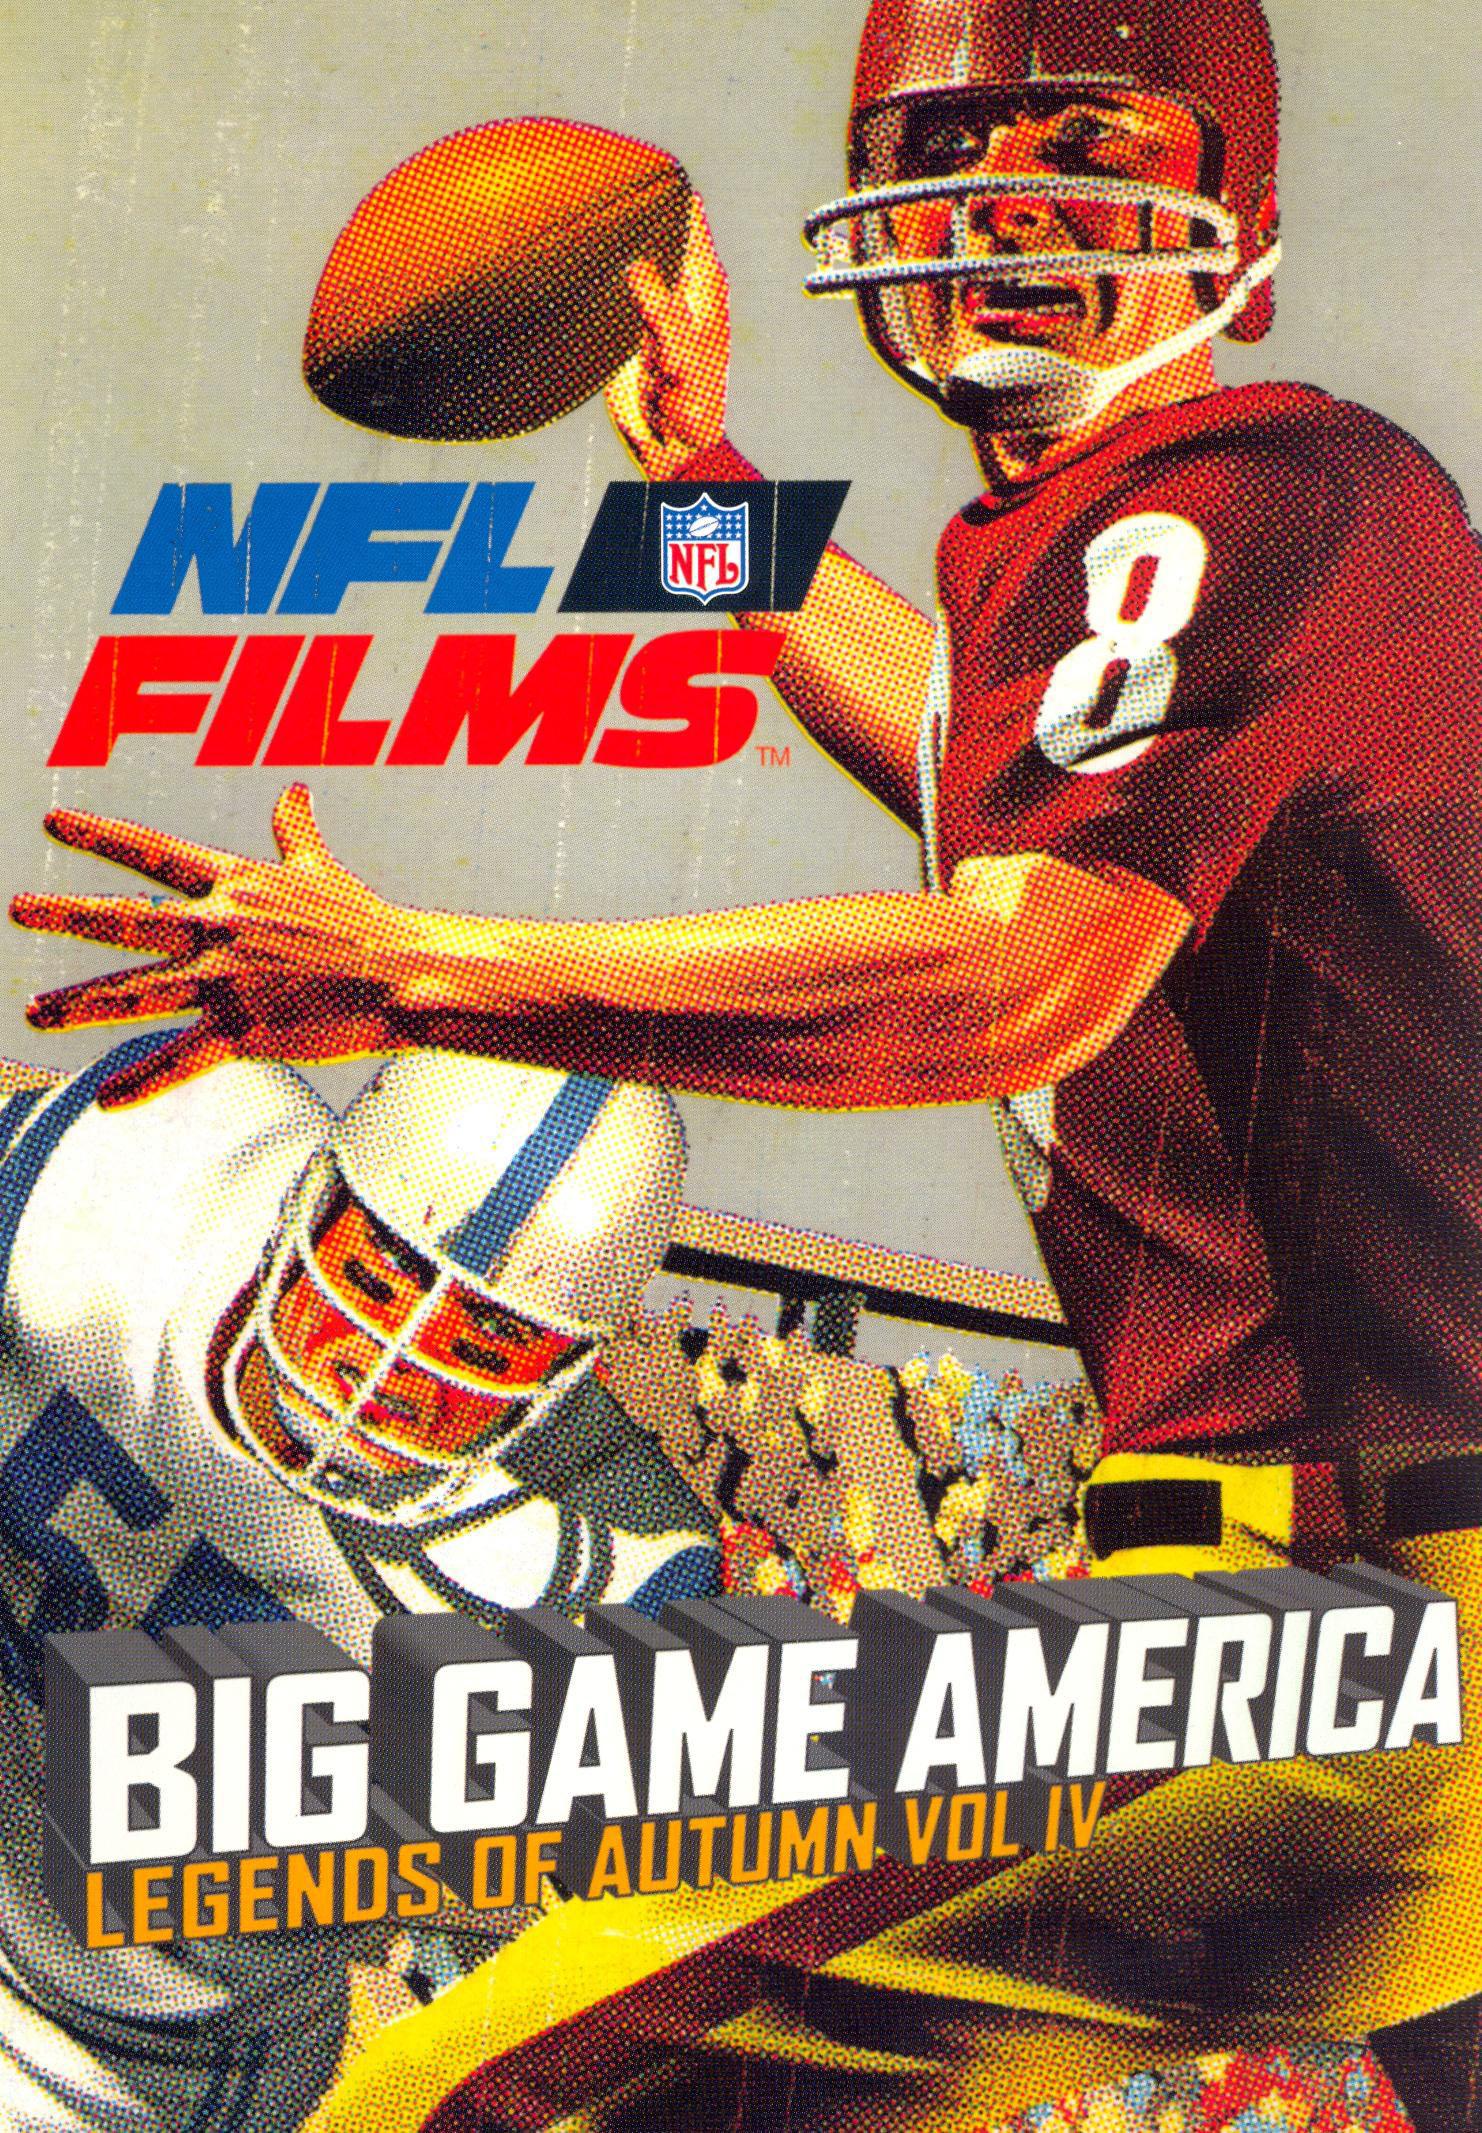 nfl films legends of autumn vol iv big game america